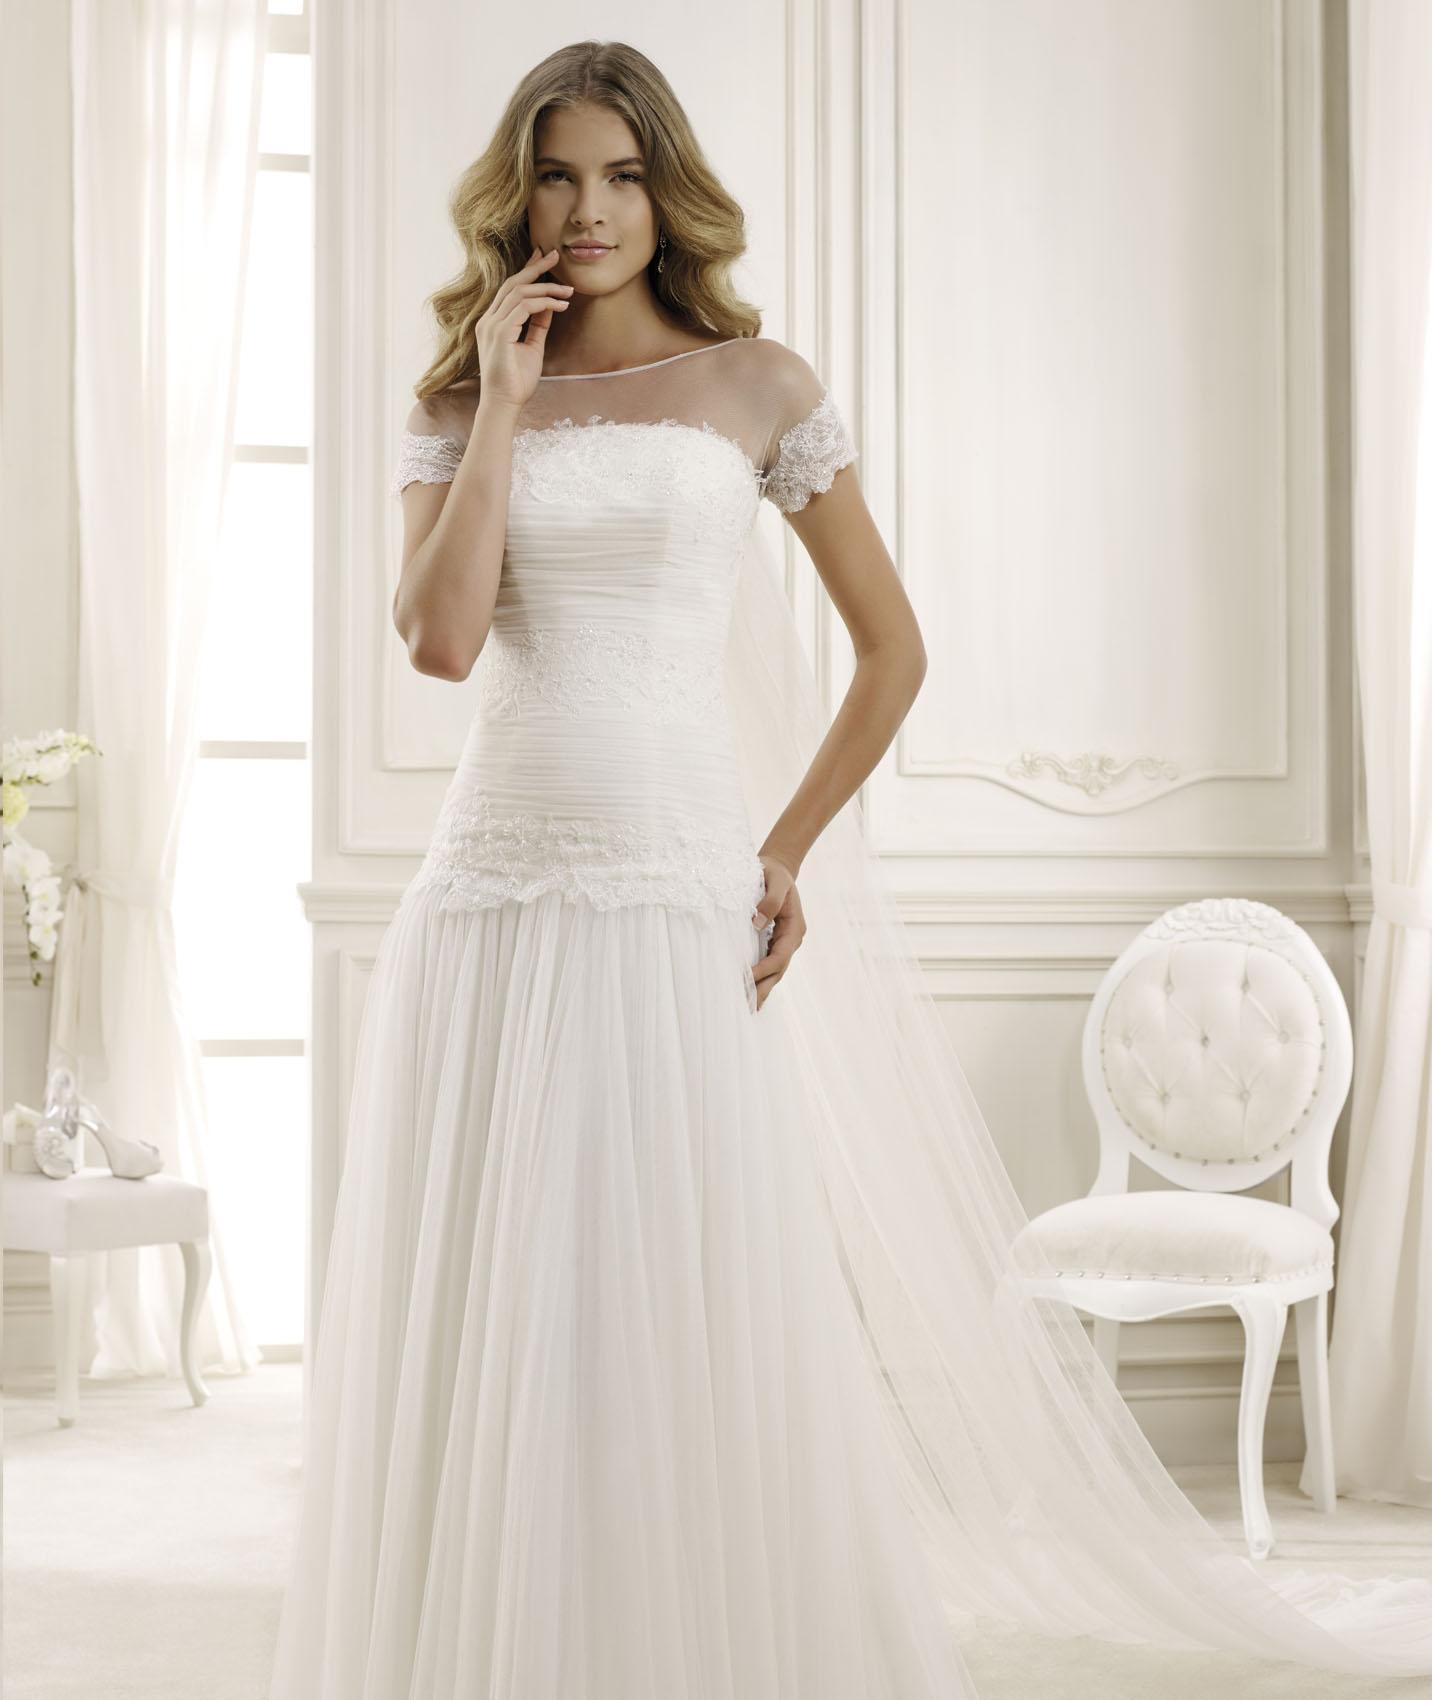 http://www.aislestyle.co.uk/elegant-sheathcolumn-bateau-beadingsequins-lace-sweepbrush-train-tulle-wedding-dresses-p-2707.html